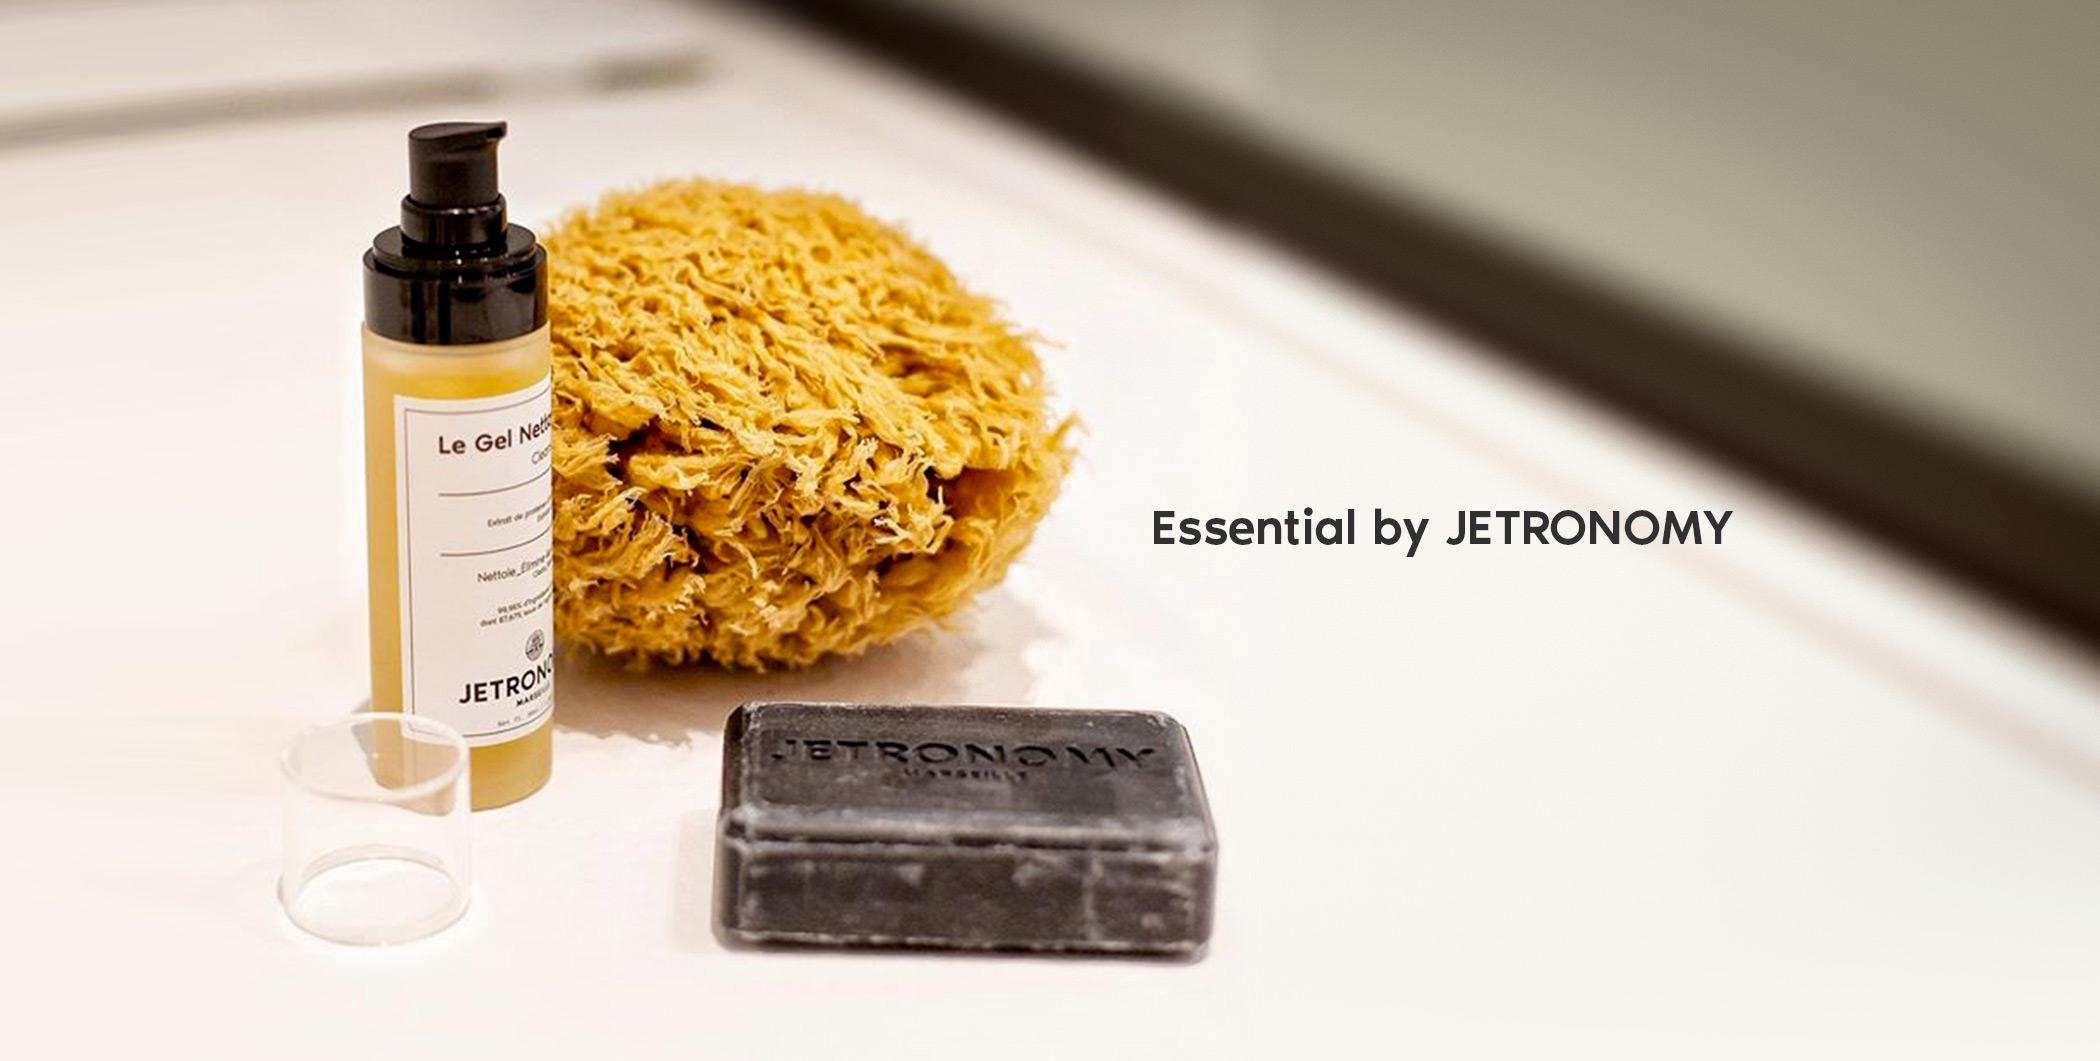 routine jetronomy soins naturels cosmetique bio savons